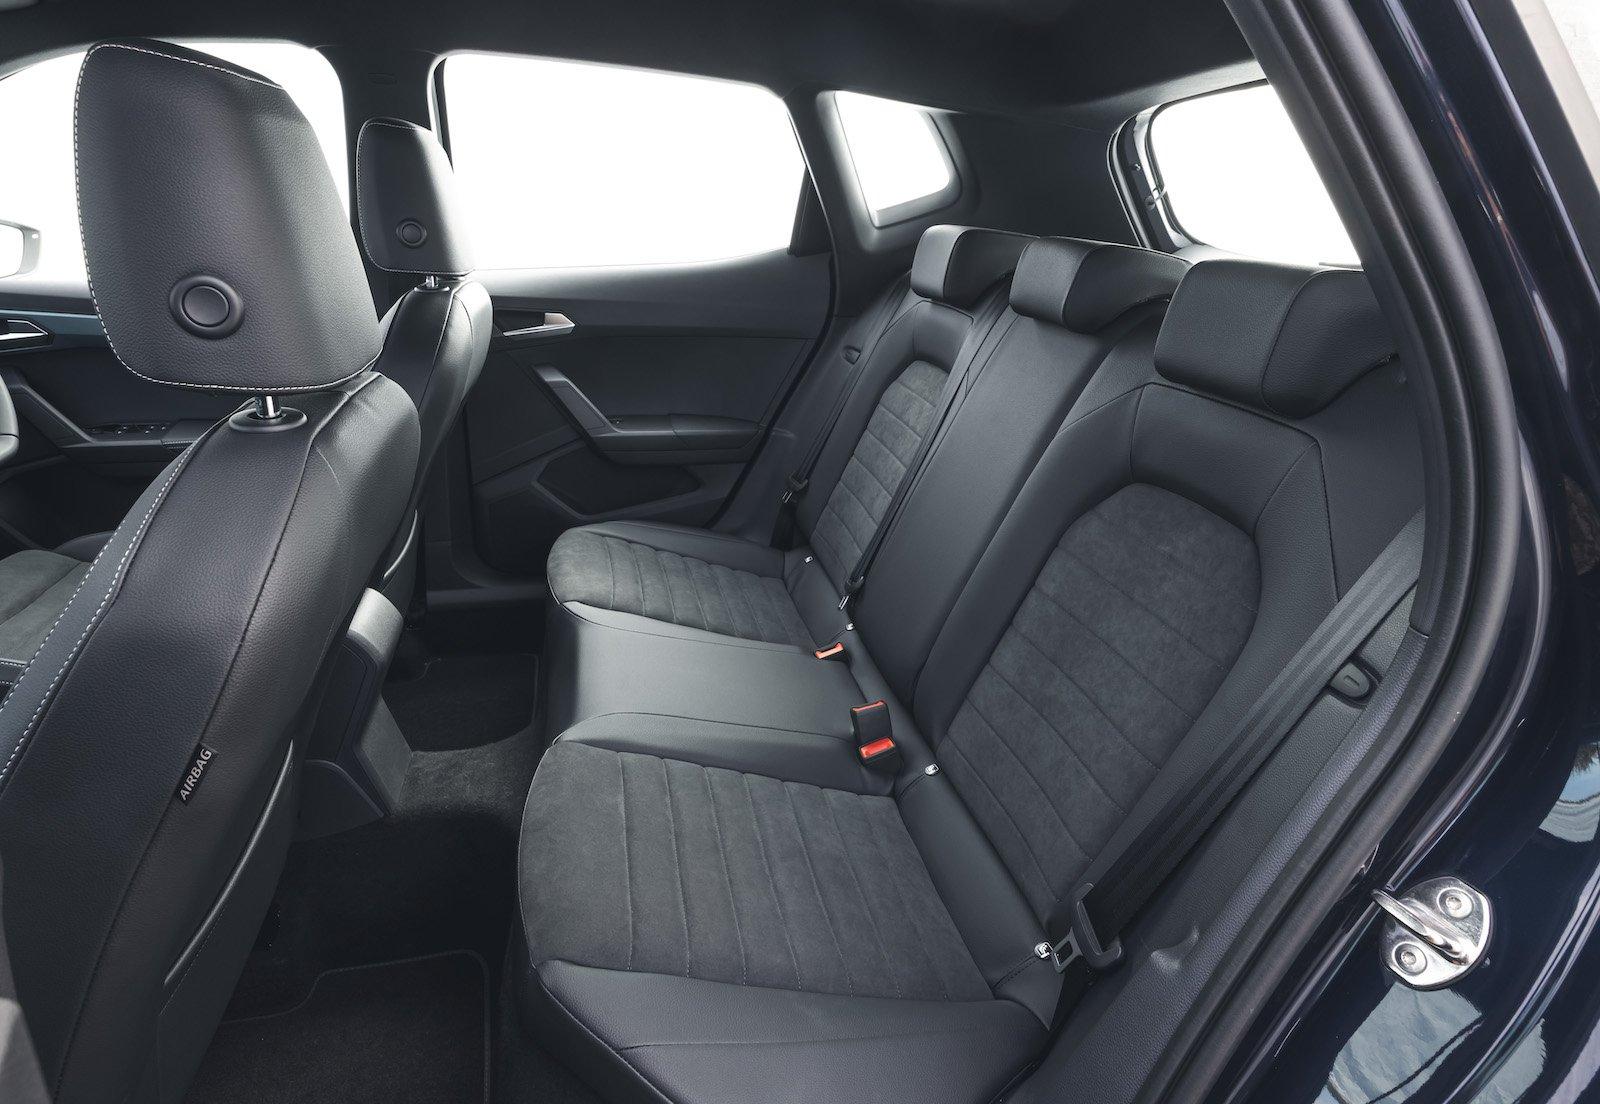 Seat Arona 2021 interior rear seats